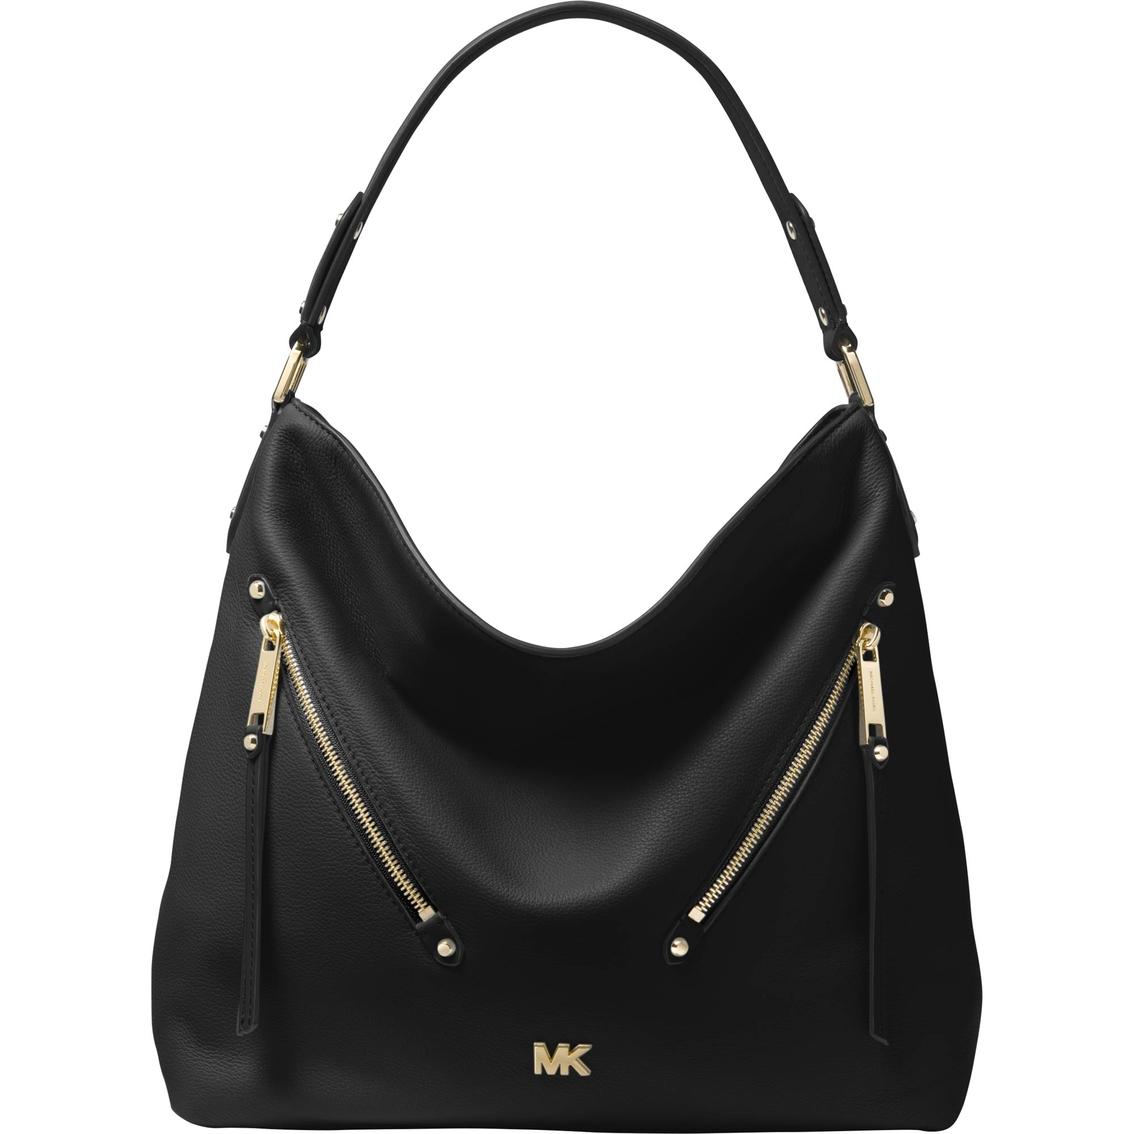 842ec67823df57 Michael Kors Evie Large Hobo Shoulder Bag | Handbags | Shop The Exchange